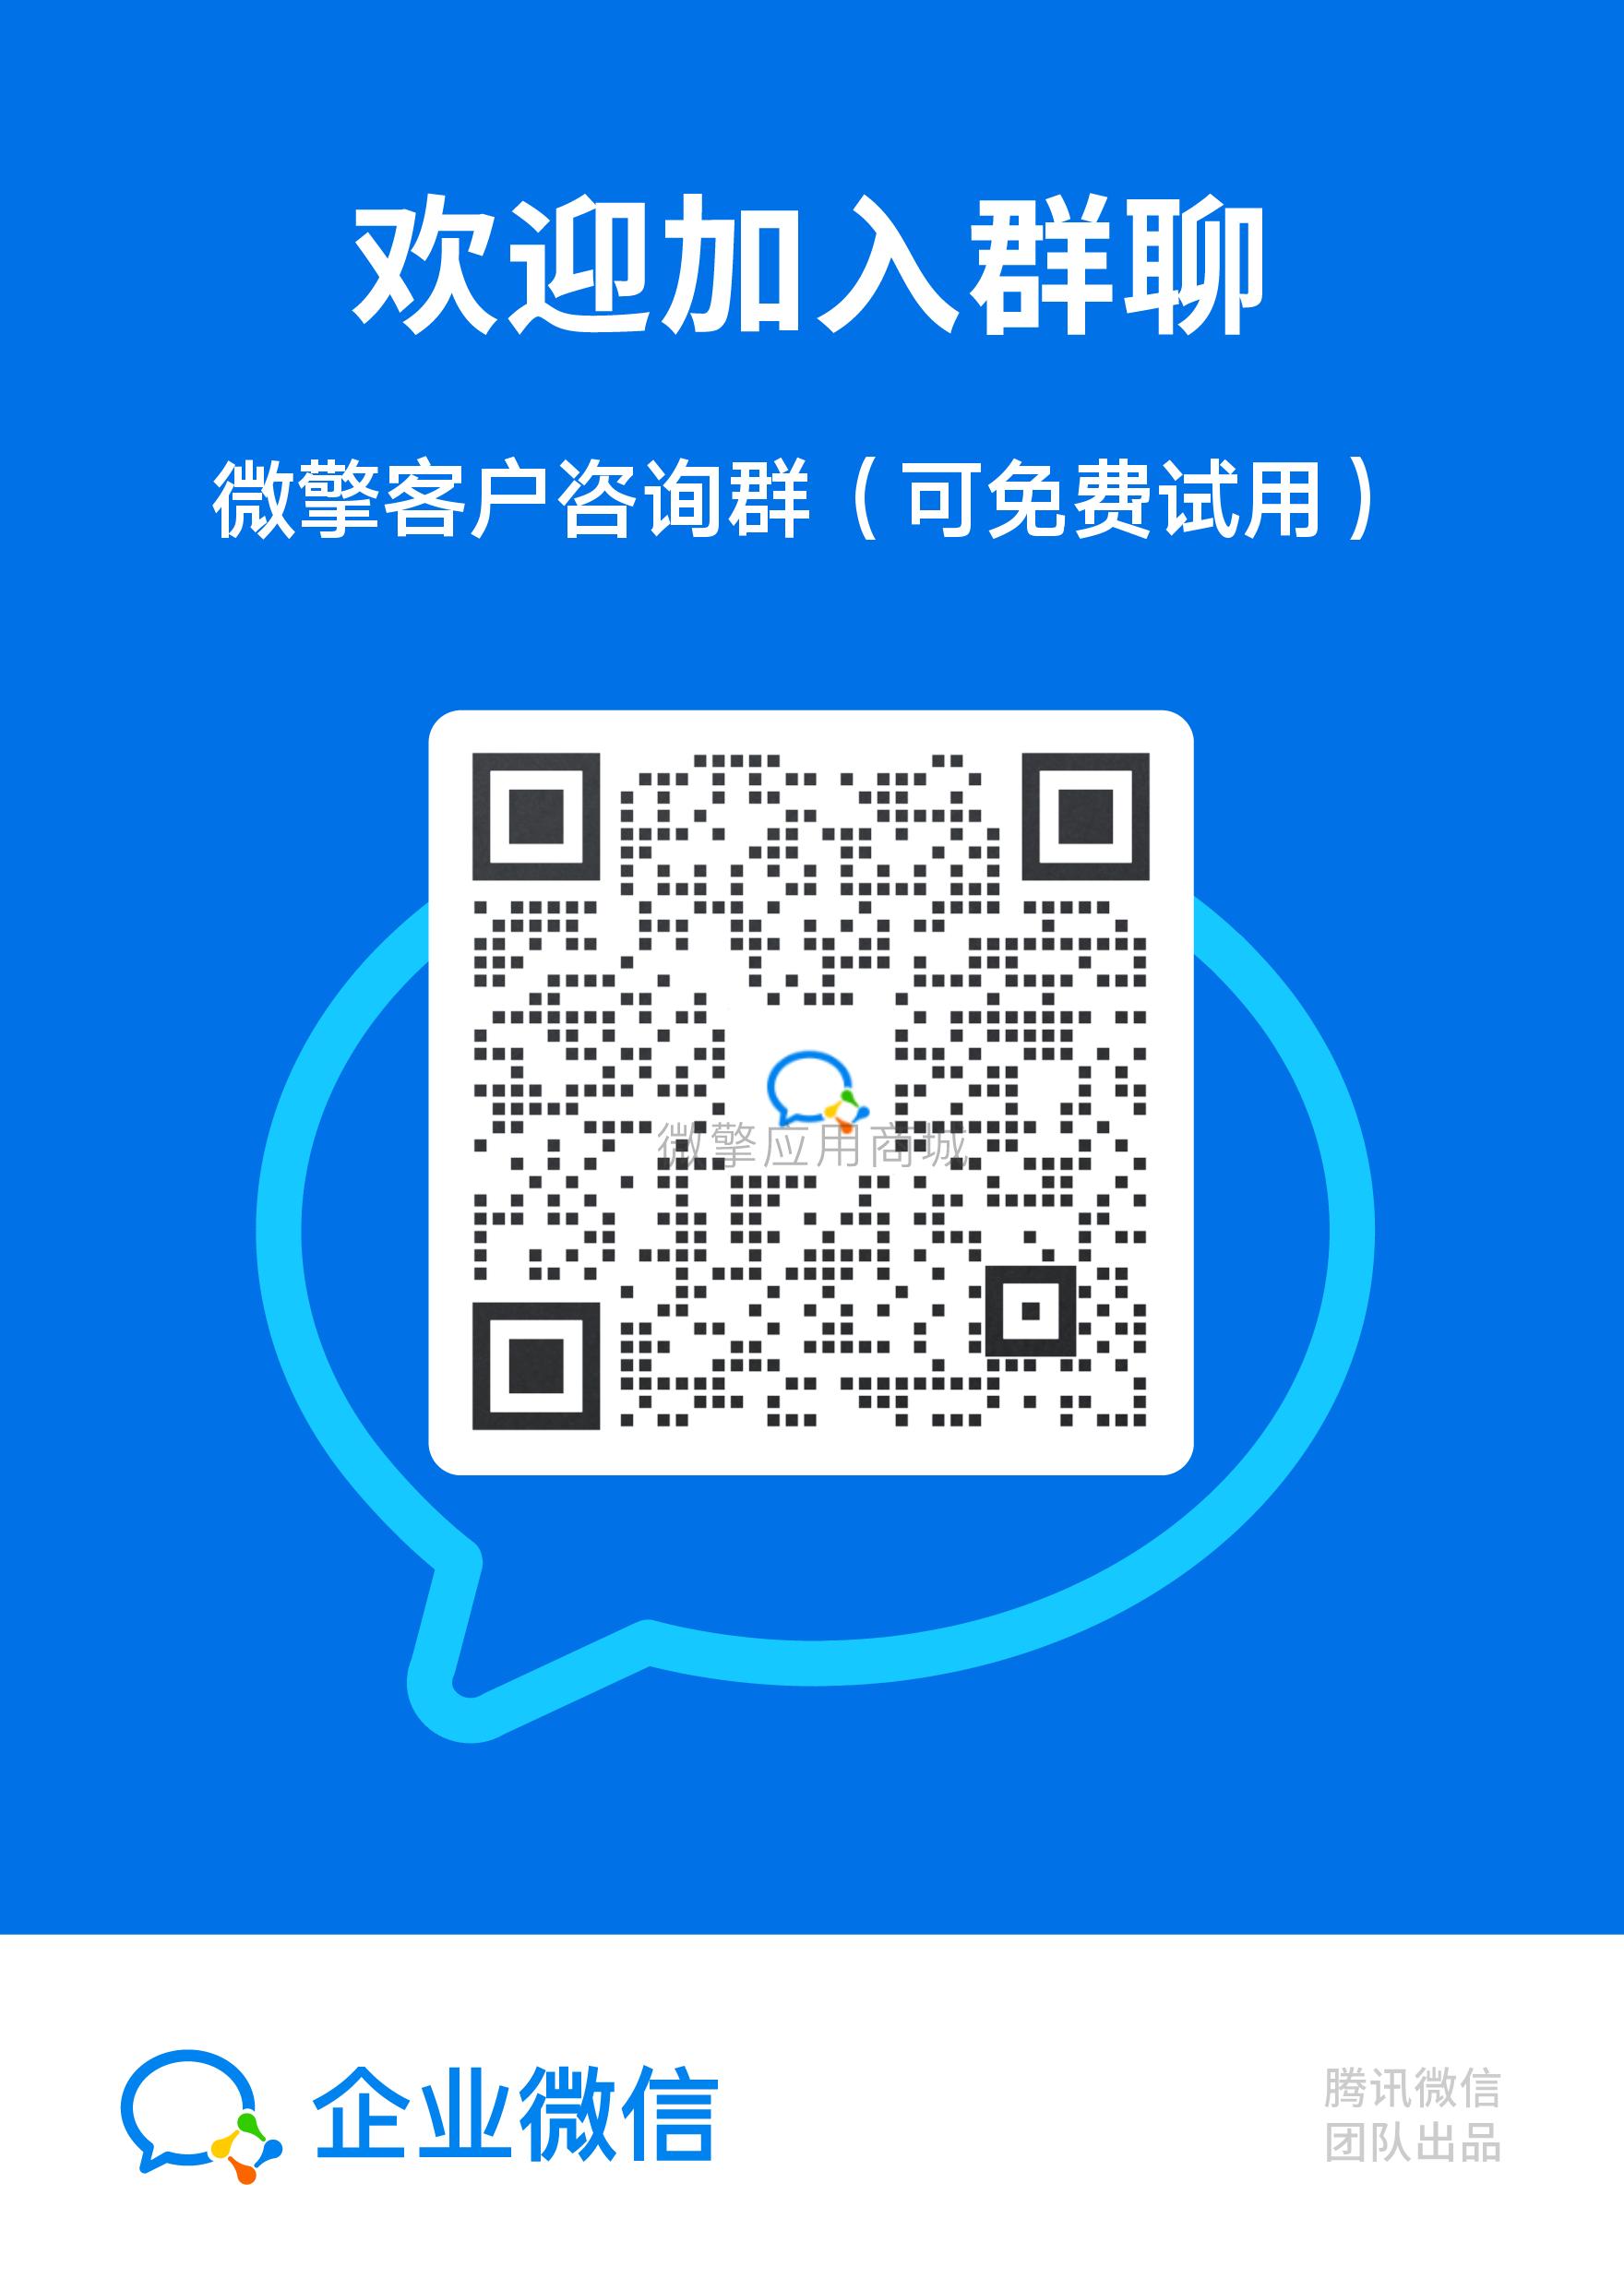 contact_me_qr.jpeg